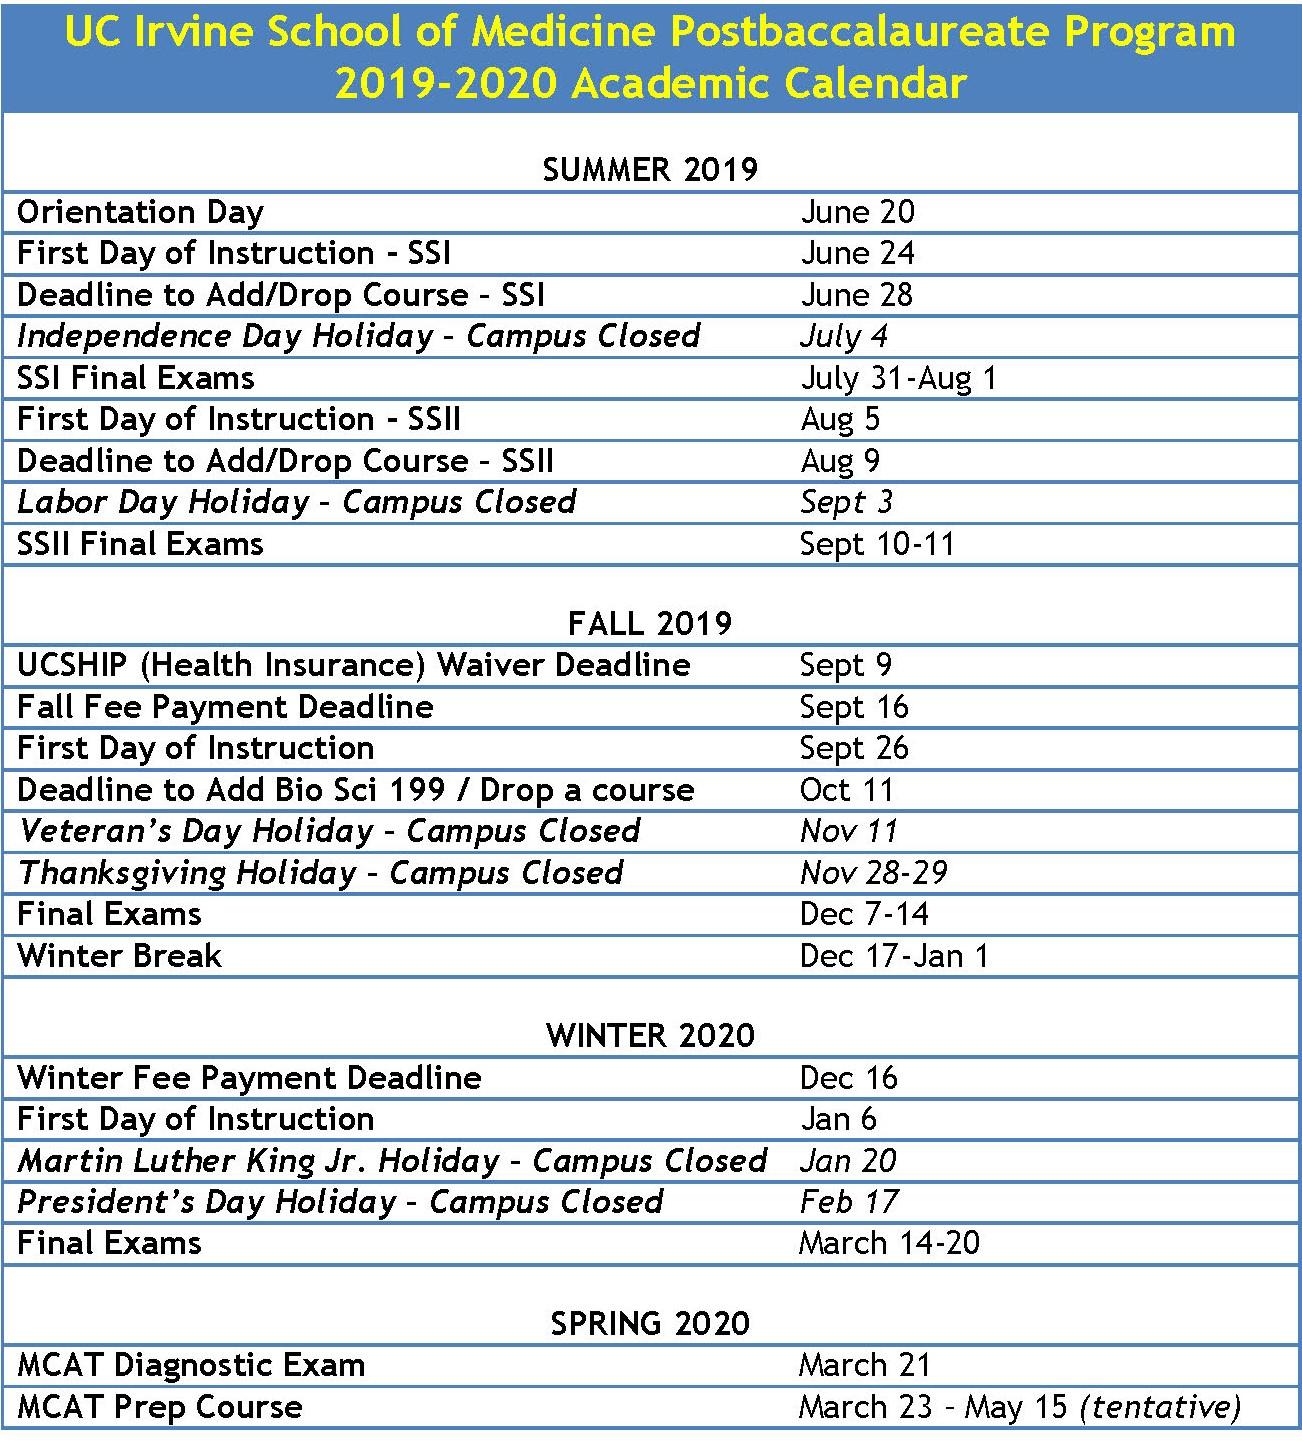 Postbaccalaureate Program | Medical Education | School Of within Uci Quarterly Calendar